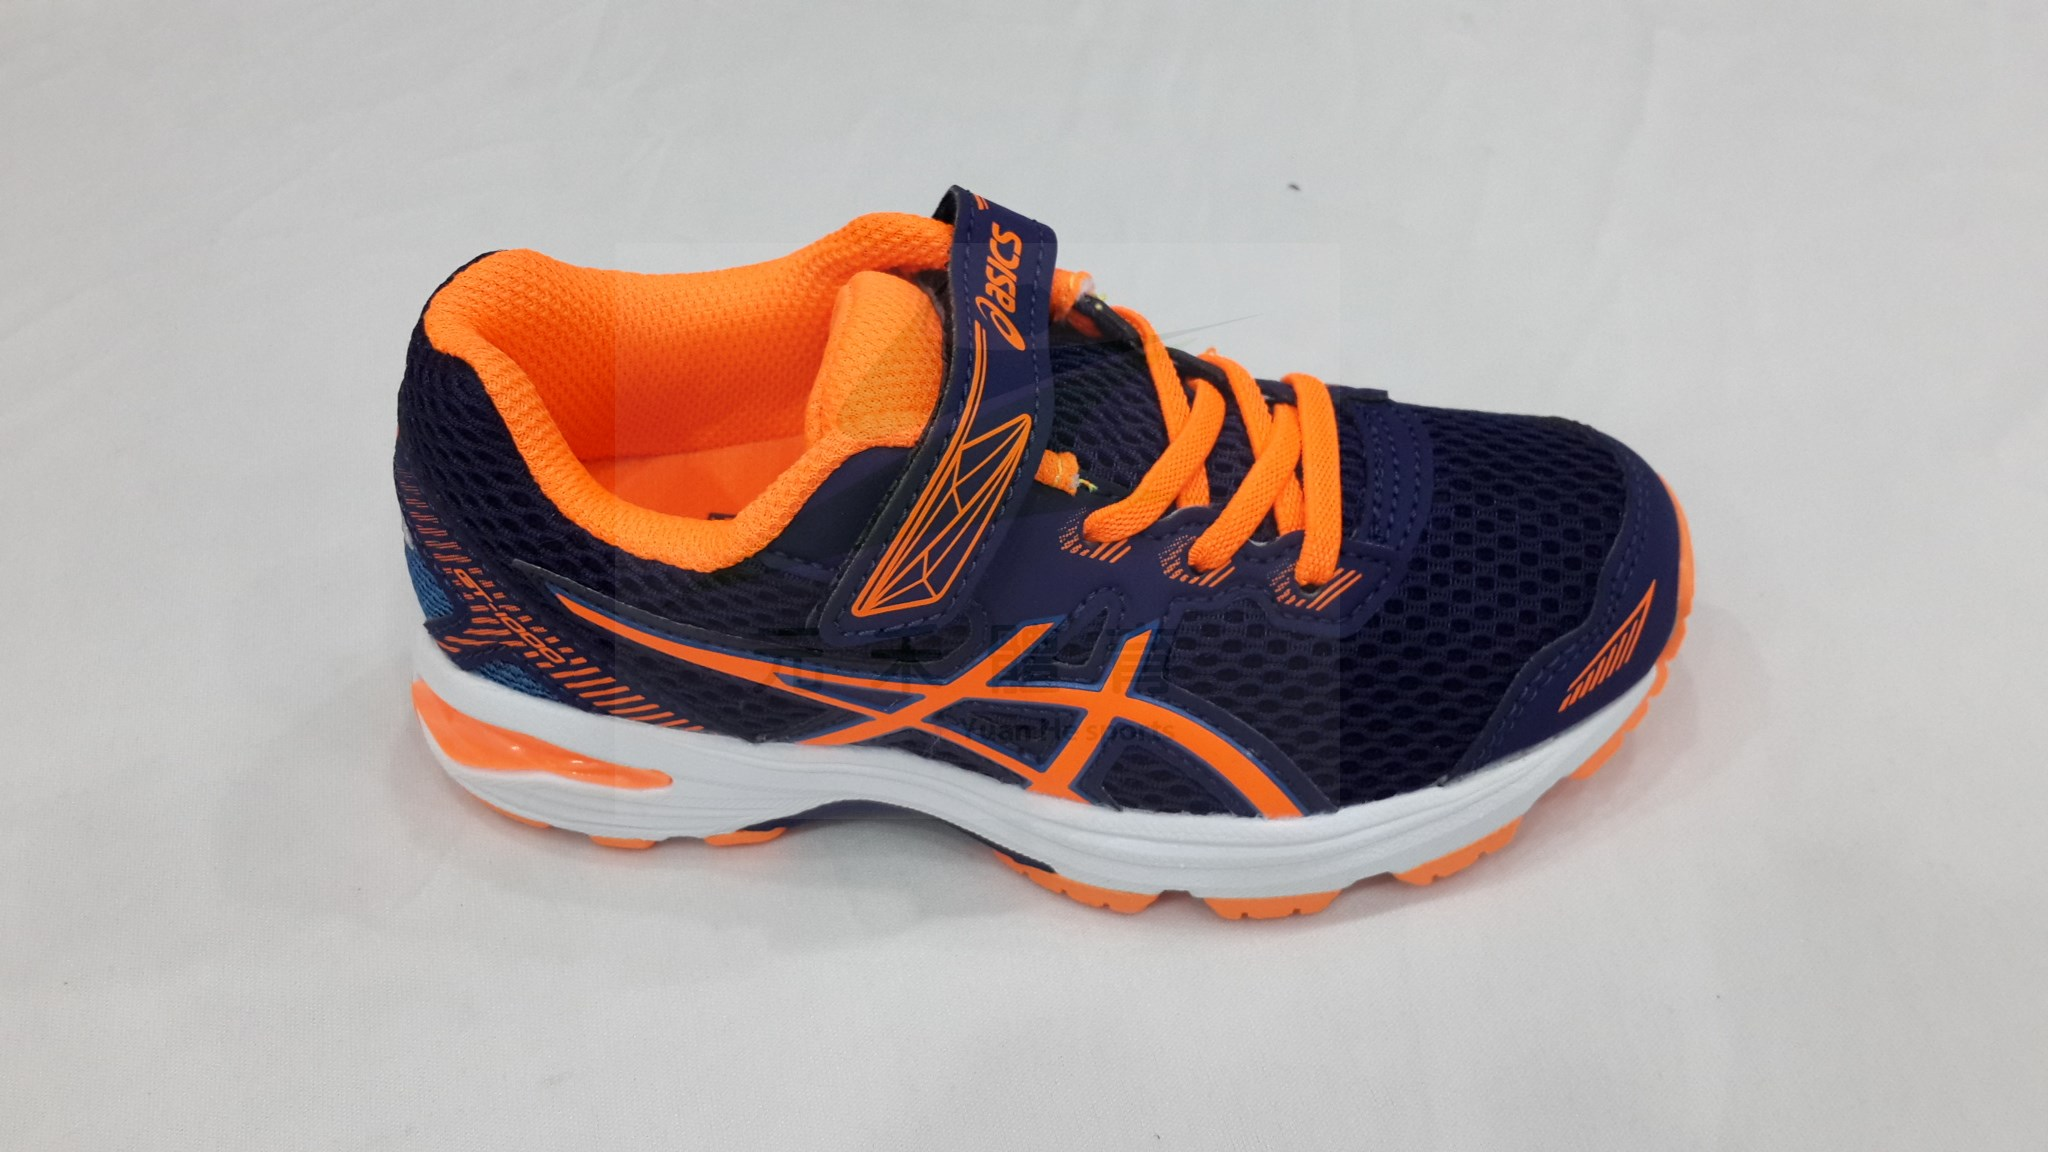 元禾〉ASICS亞瑟士 GT-1000 5 PS 男童鞋慢跑鞋 C620N-4930